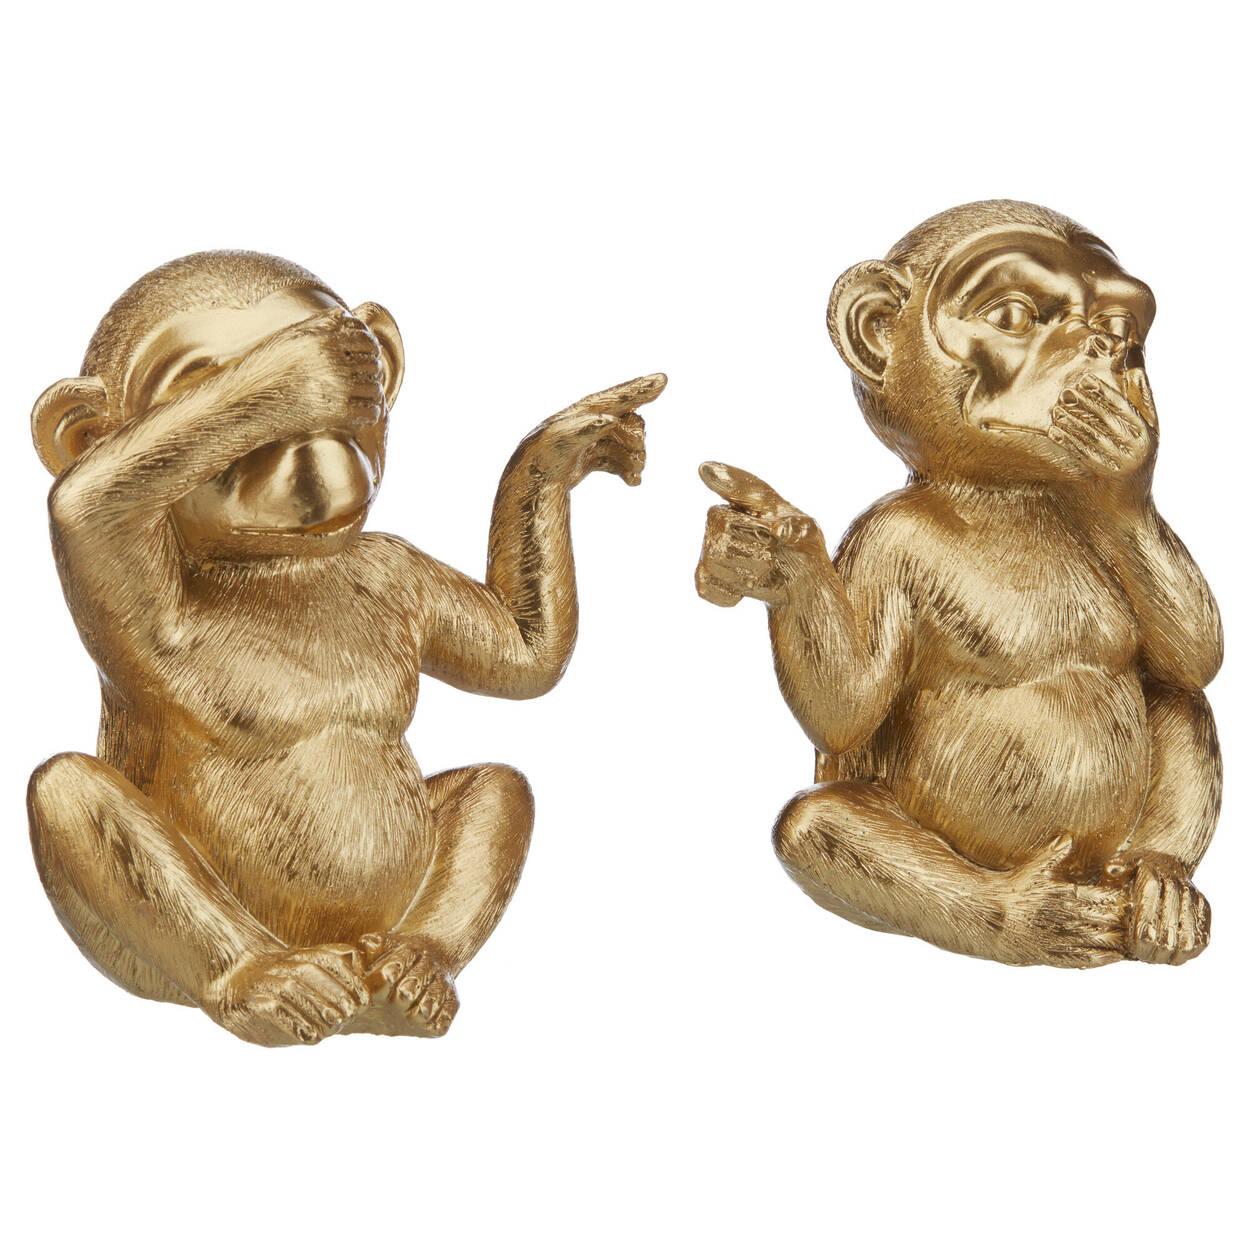 Wasn't Me Decorative Gold Monkey Set 14 cm.